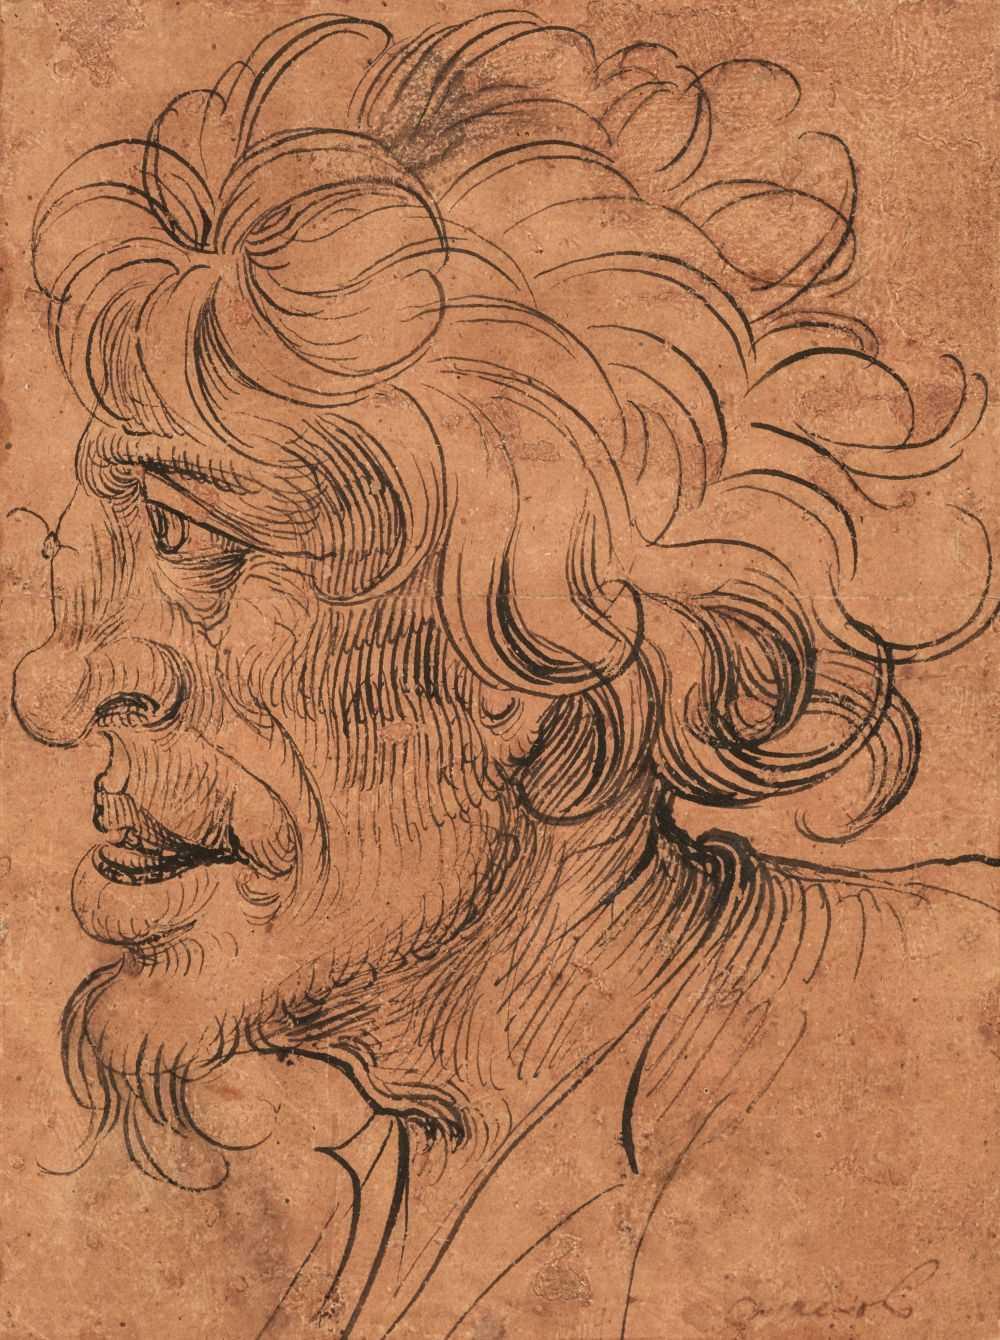 Lot 10 - German School. Head of a Wild Man, first half 16th century